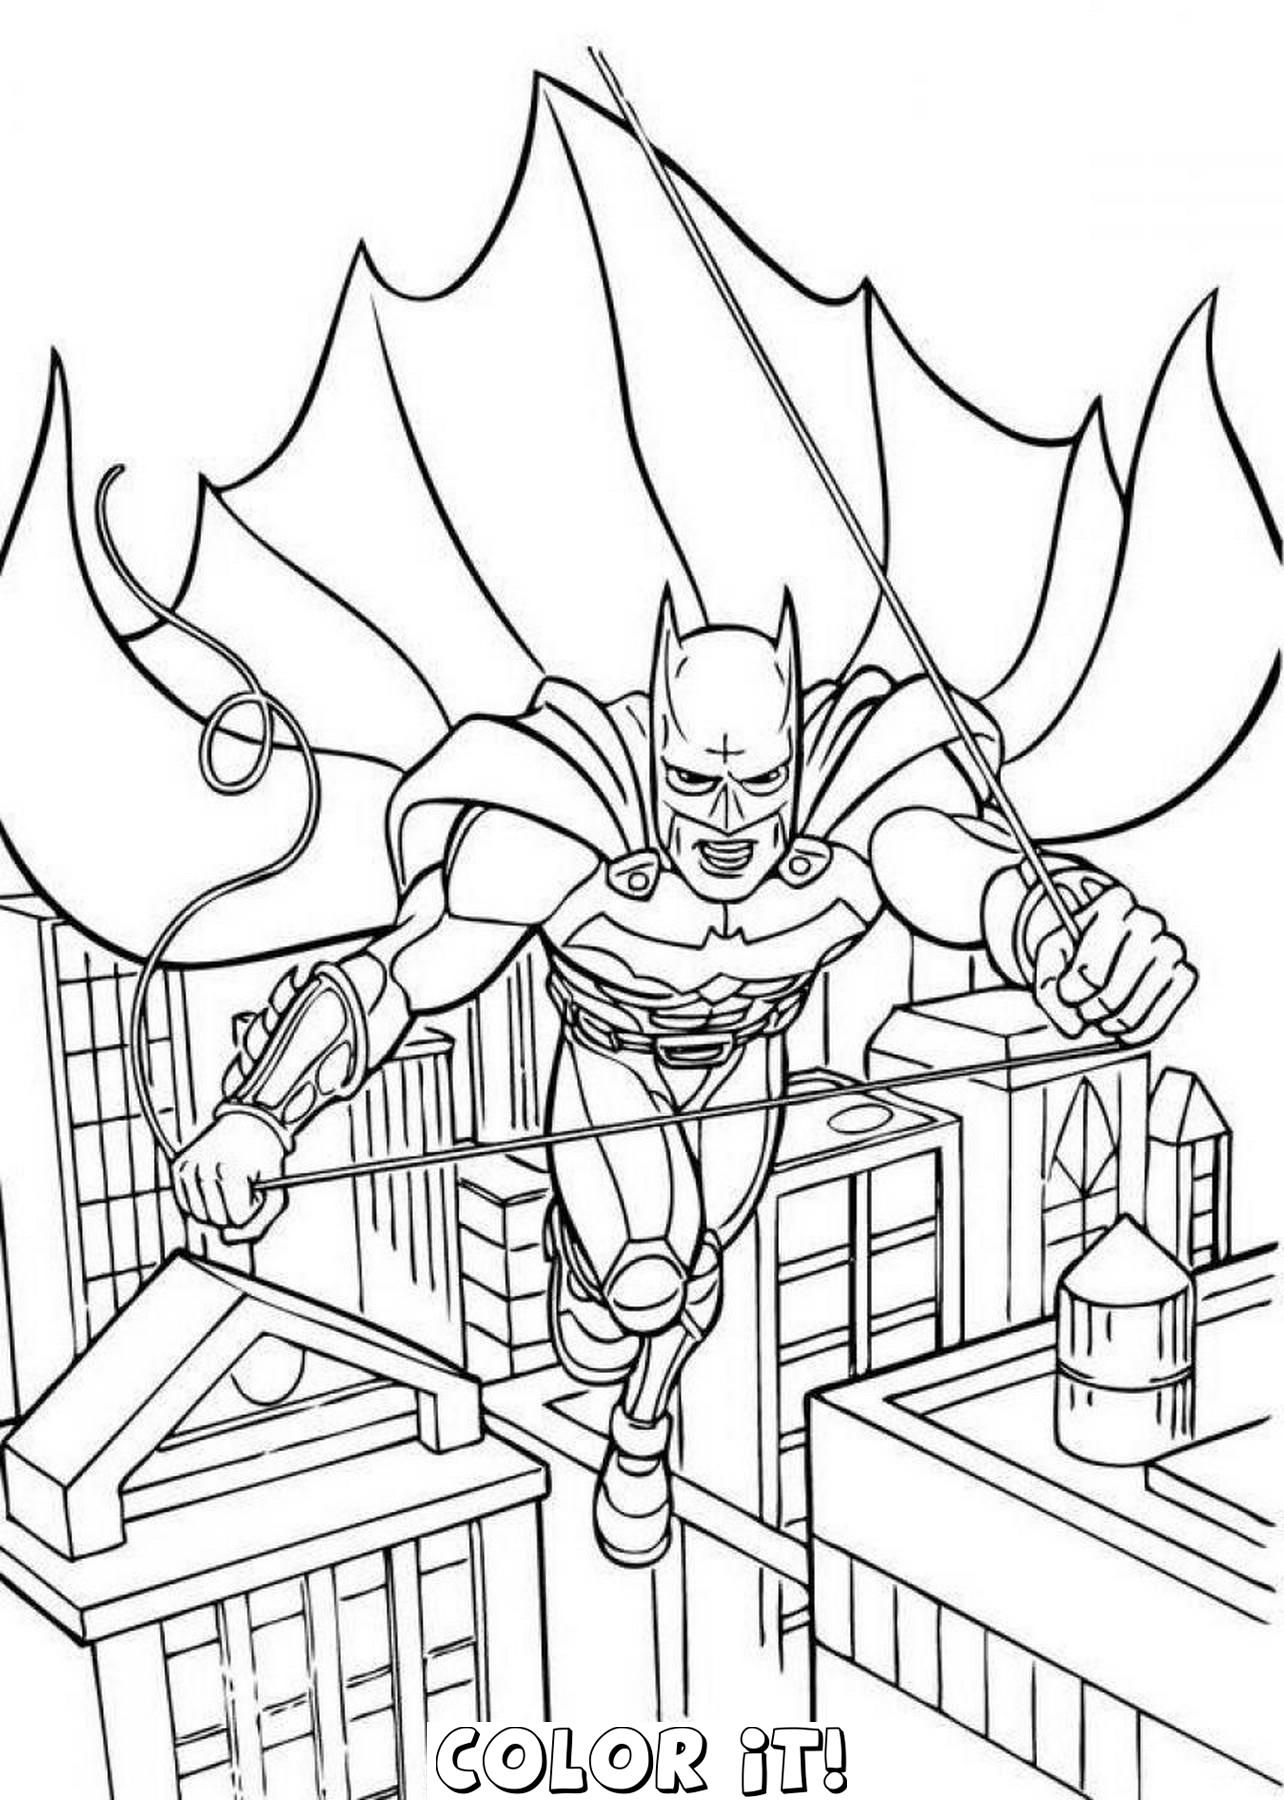 Batman Drawing Games at GetDrawings.com | Free for personal use ...